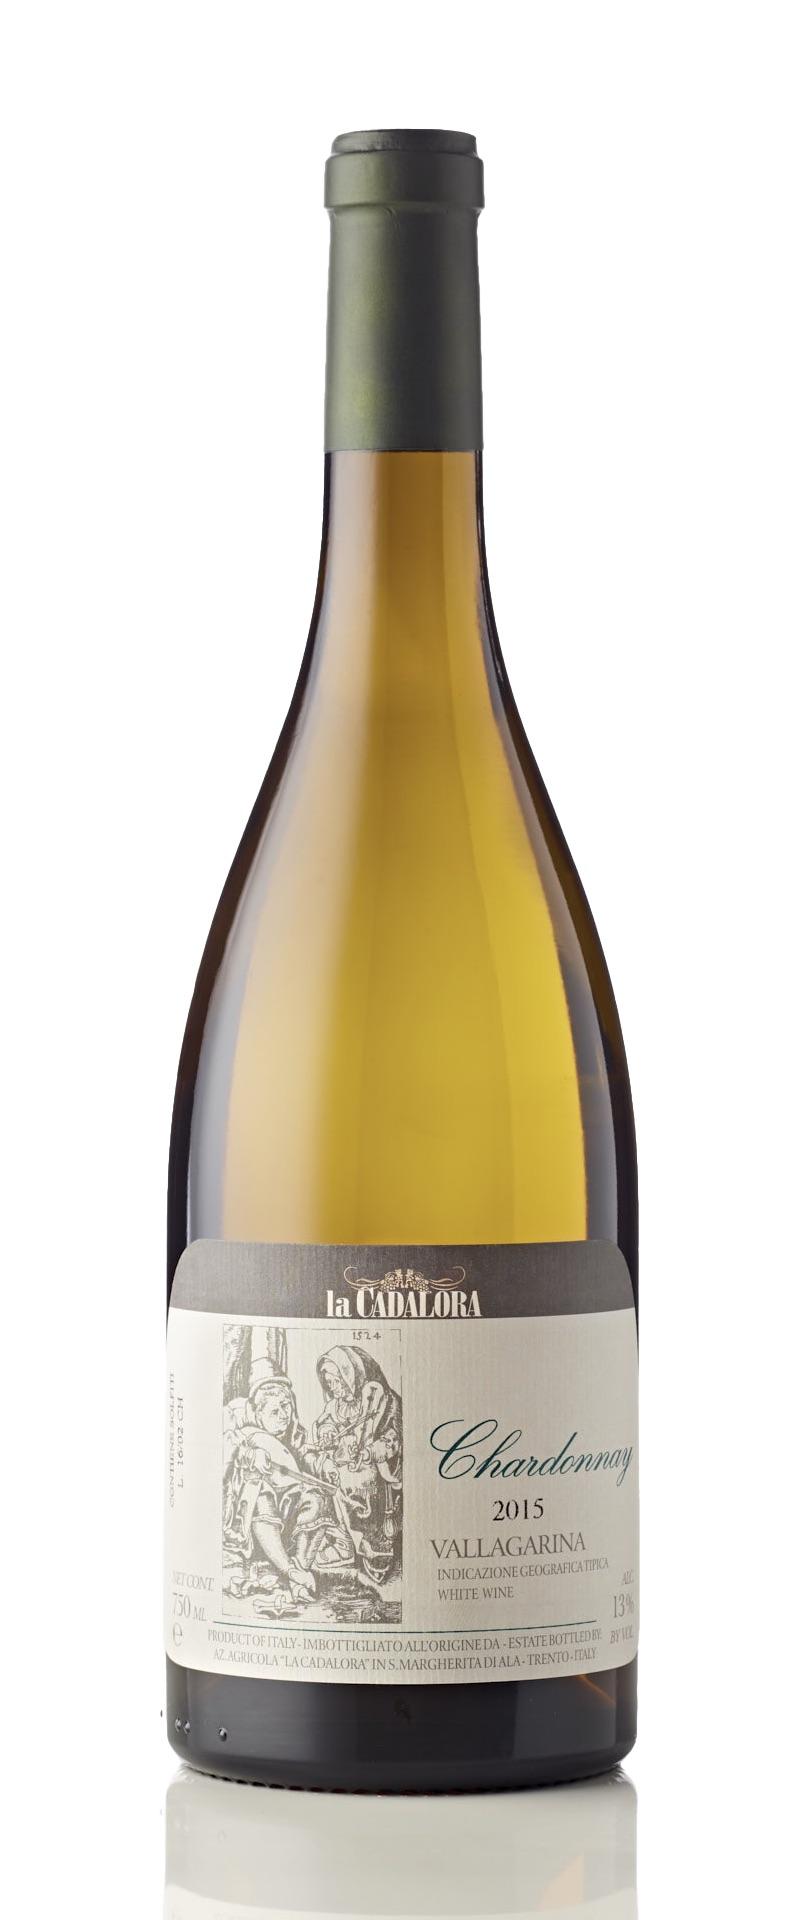 La Cadalora Chardonnay Vallagarina IGT.jpg